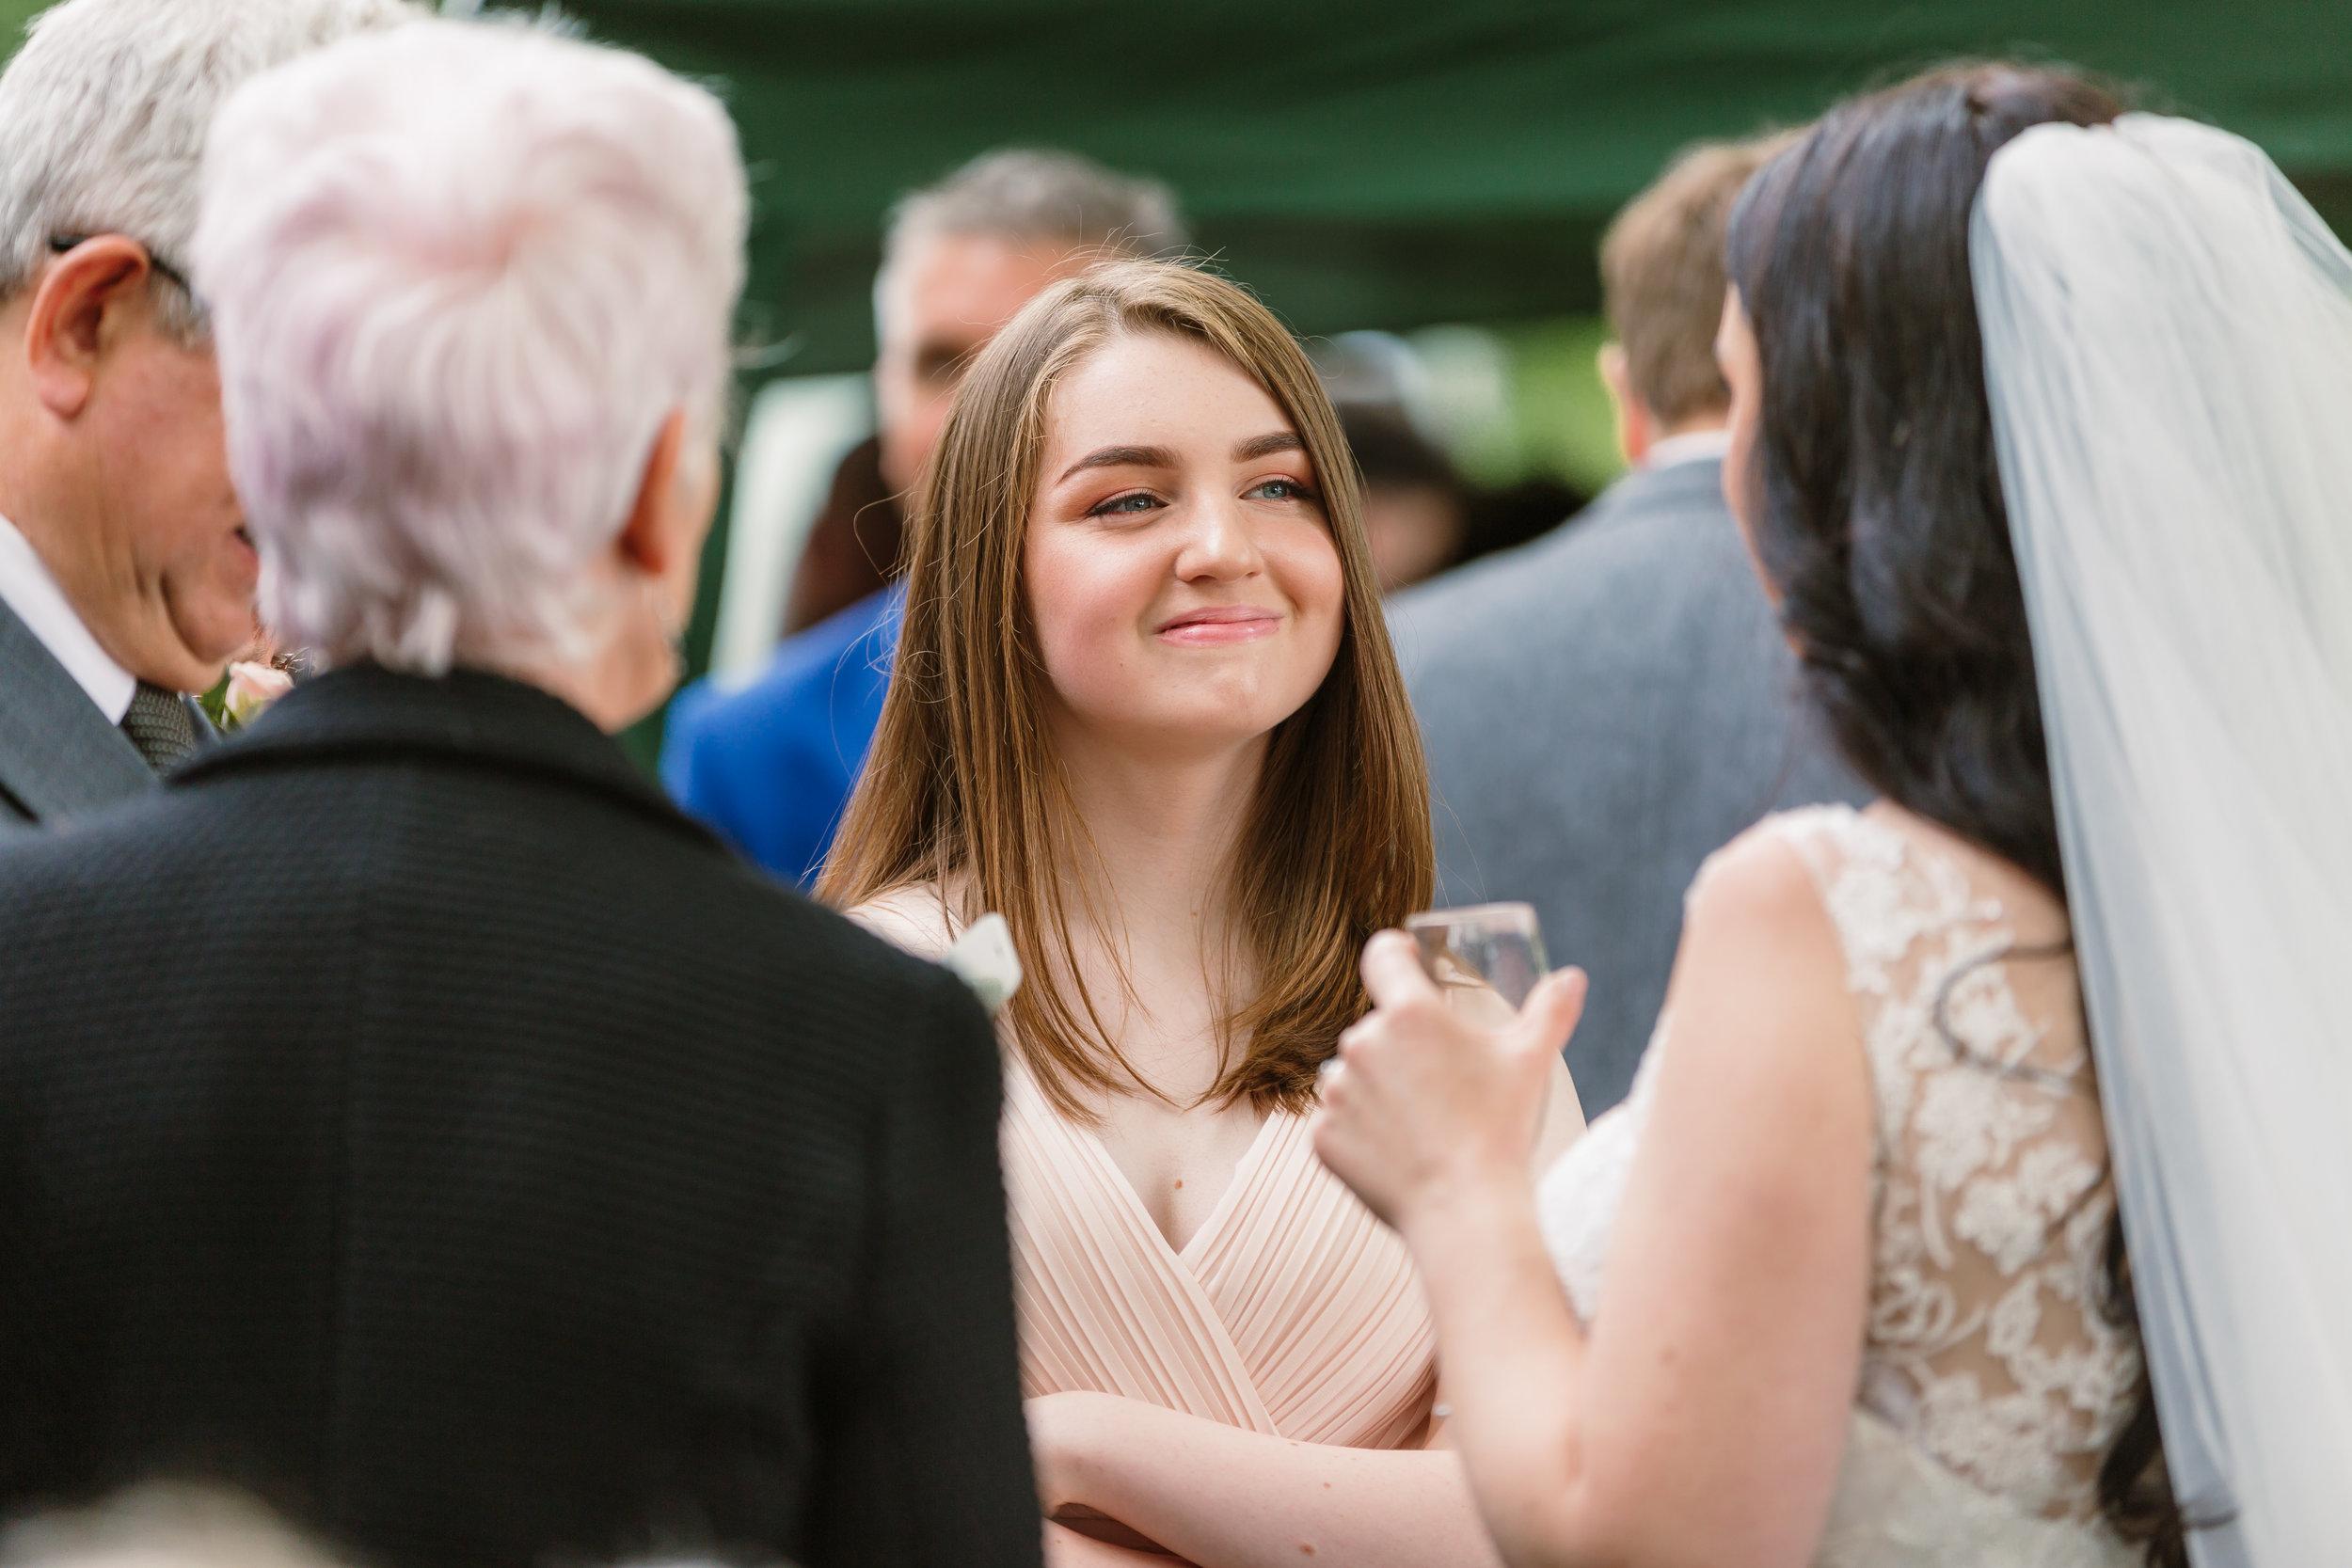 Sarah-Fishlock-Photography : Hampshire-wedding-photographer-hampshire : fleet-wedding-photographer-fleet : Meade-Hall-Wedding-Photographer : Meade-Hall-Wedding-Photos-642.jpg